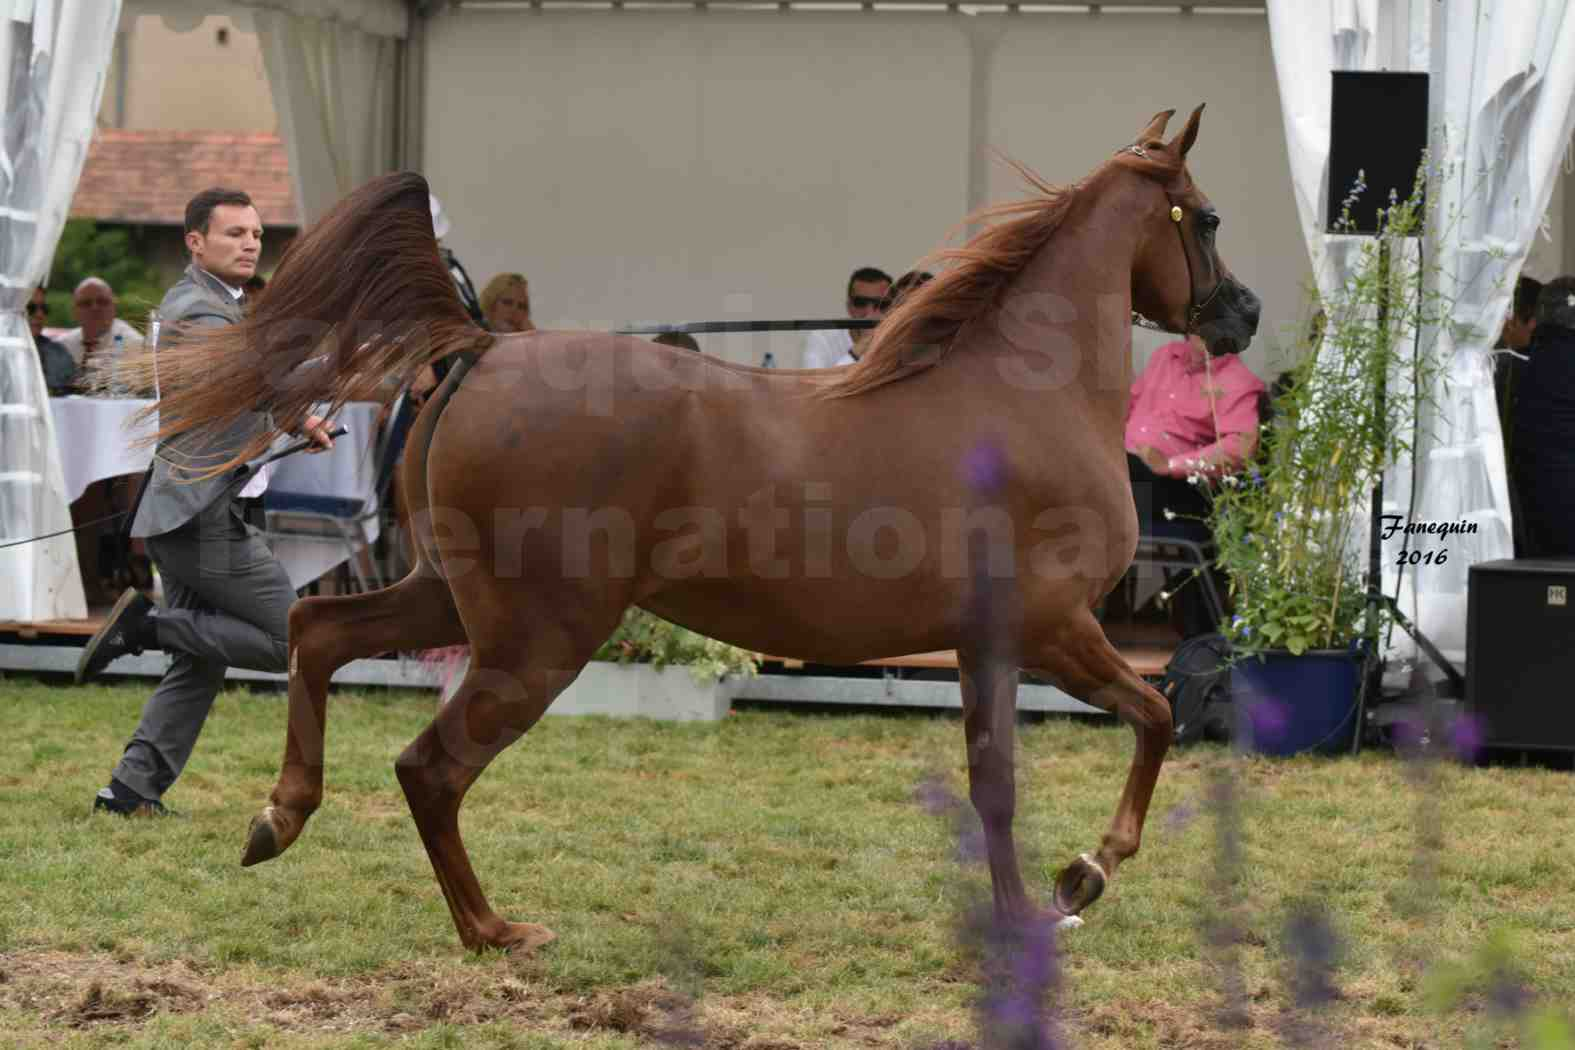 International Arabian Horse Show B de VICHY 2016 - PEARL DE DJOON - Notre Sélection - 20